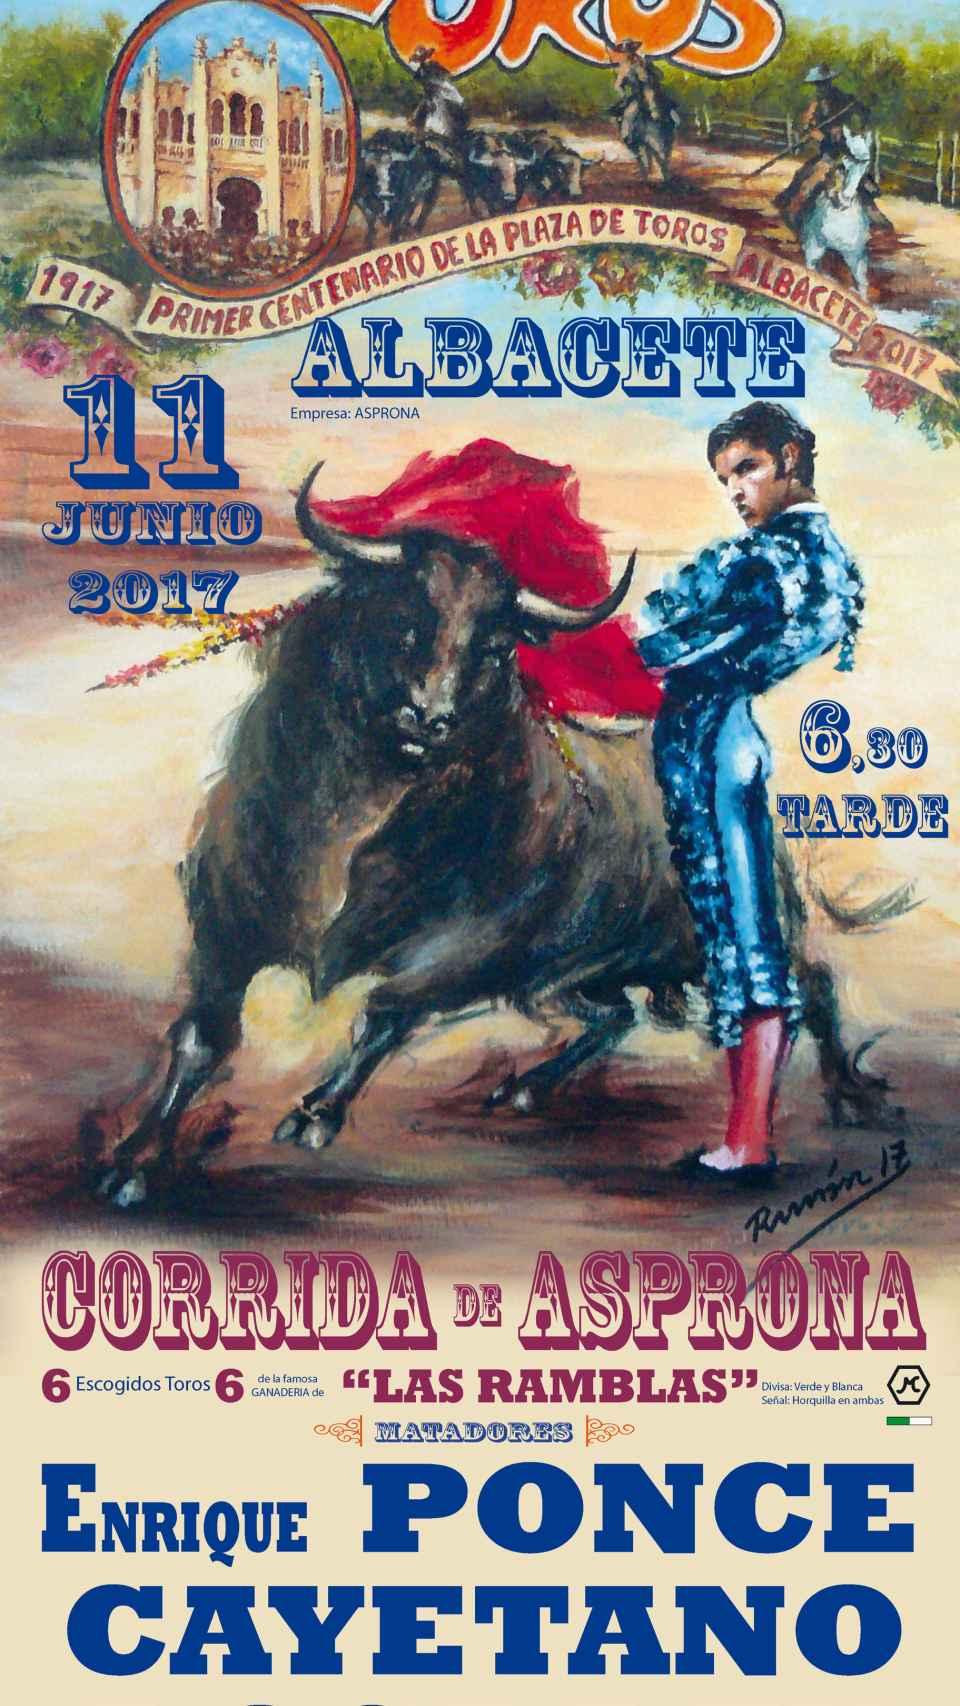 Cartel de la corrida de toros.